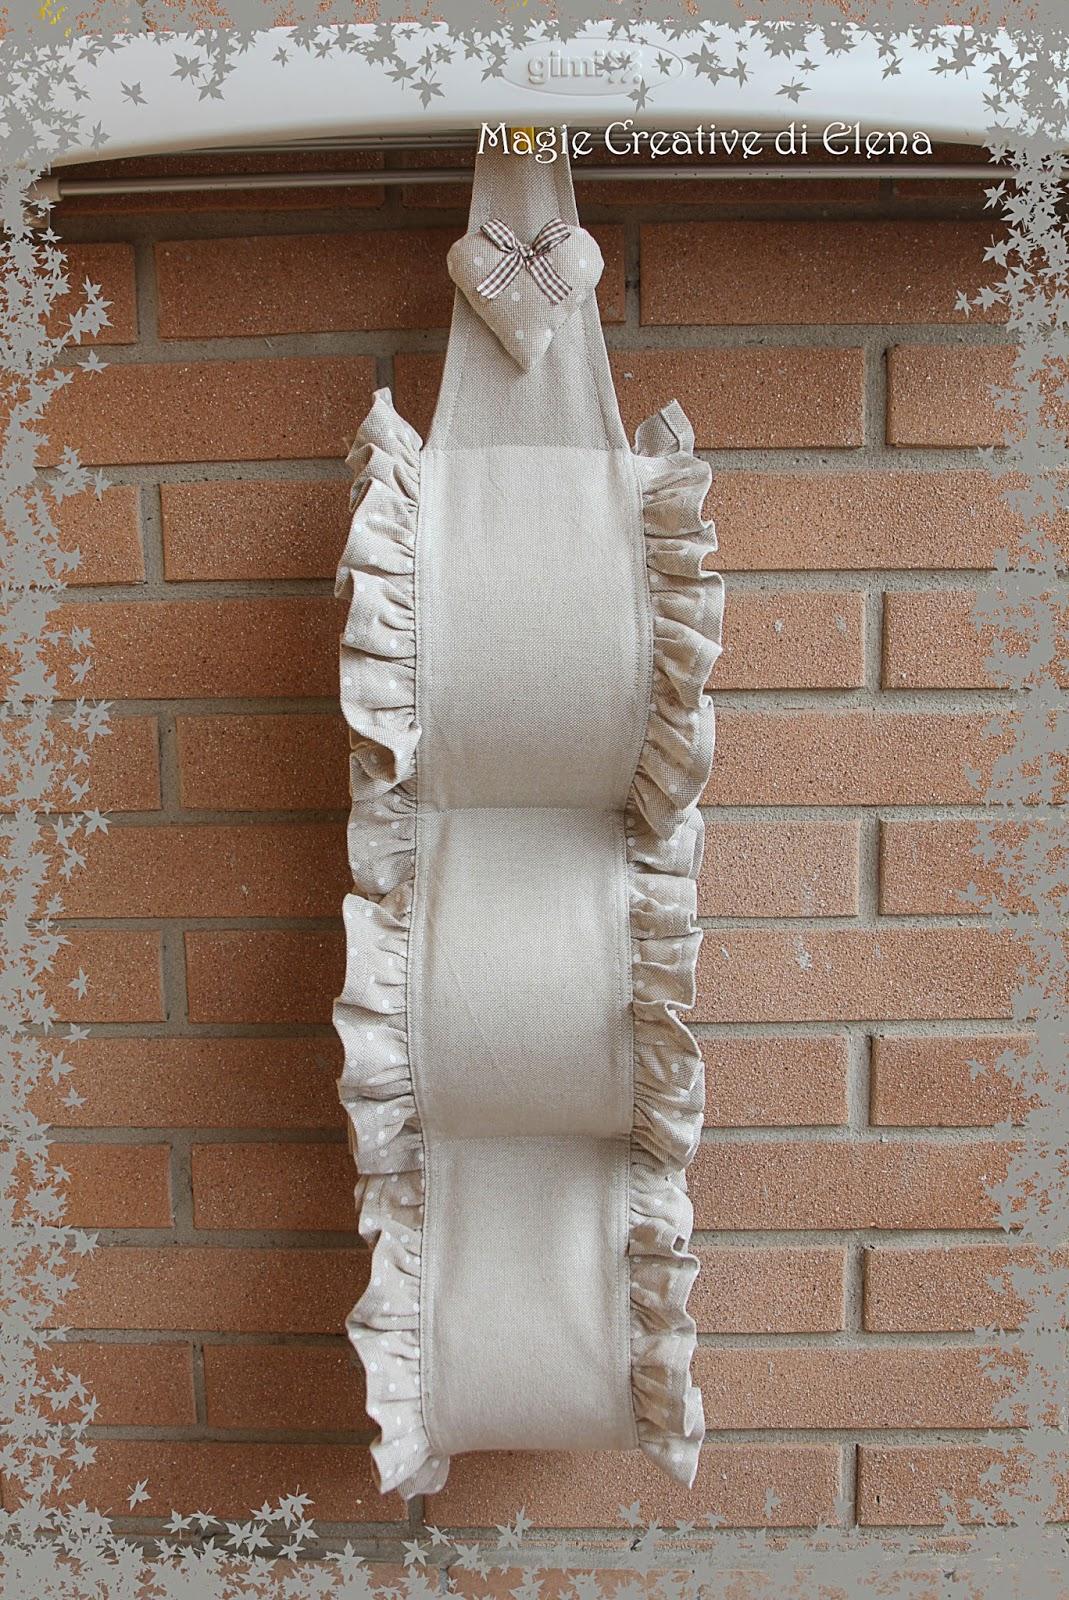 Porta Carta Igienica Originali magie creative di elena: porta rotoli carta igienica lucy